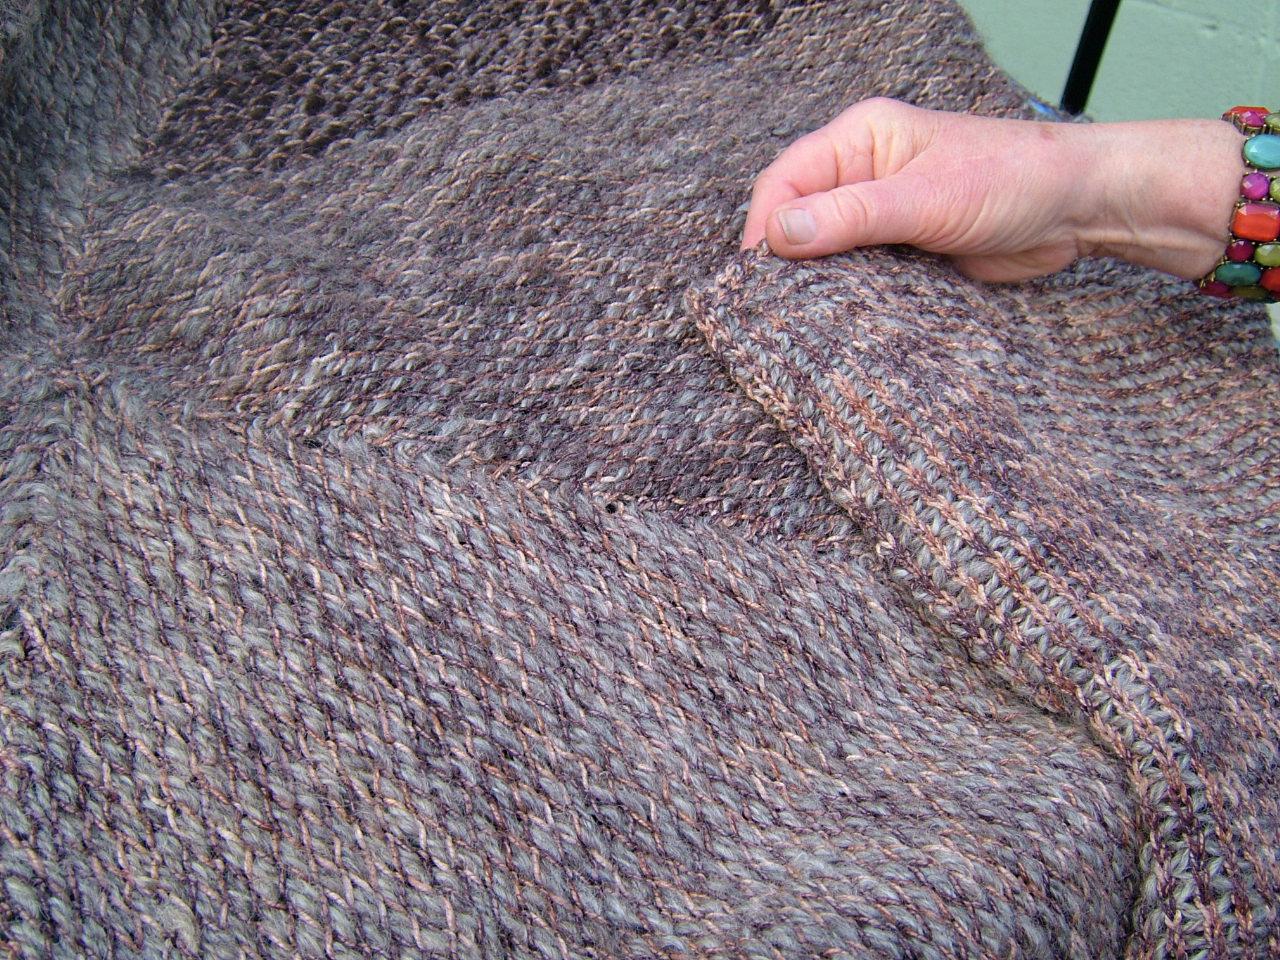 SpinningSchool: Knit weave stitch